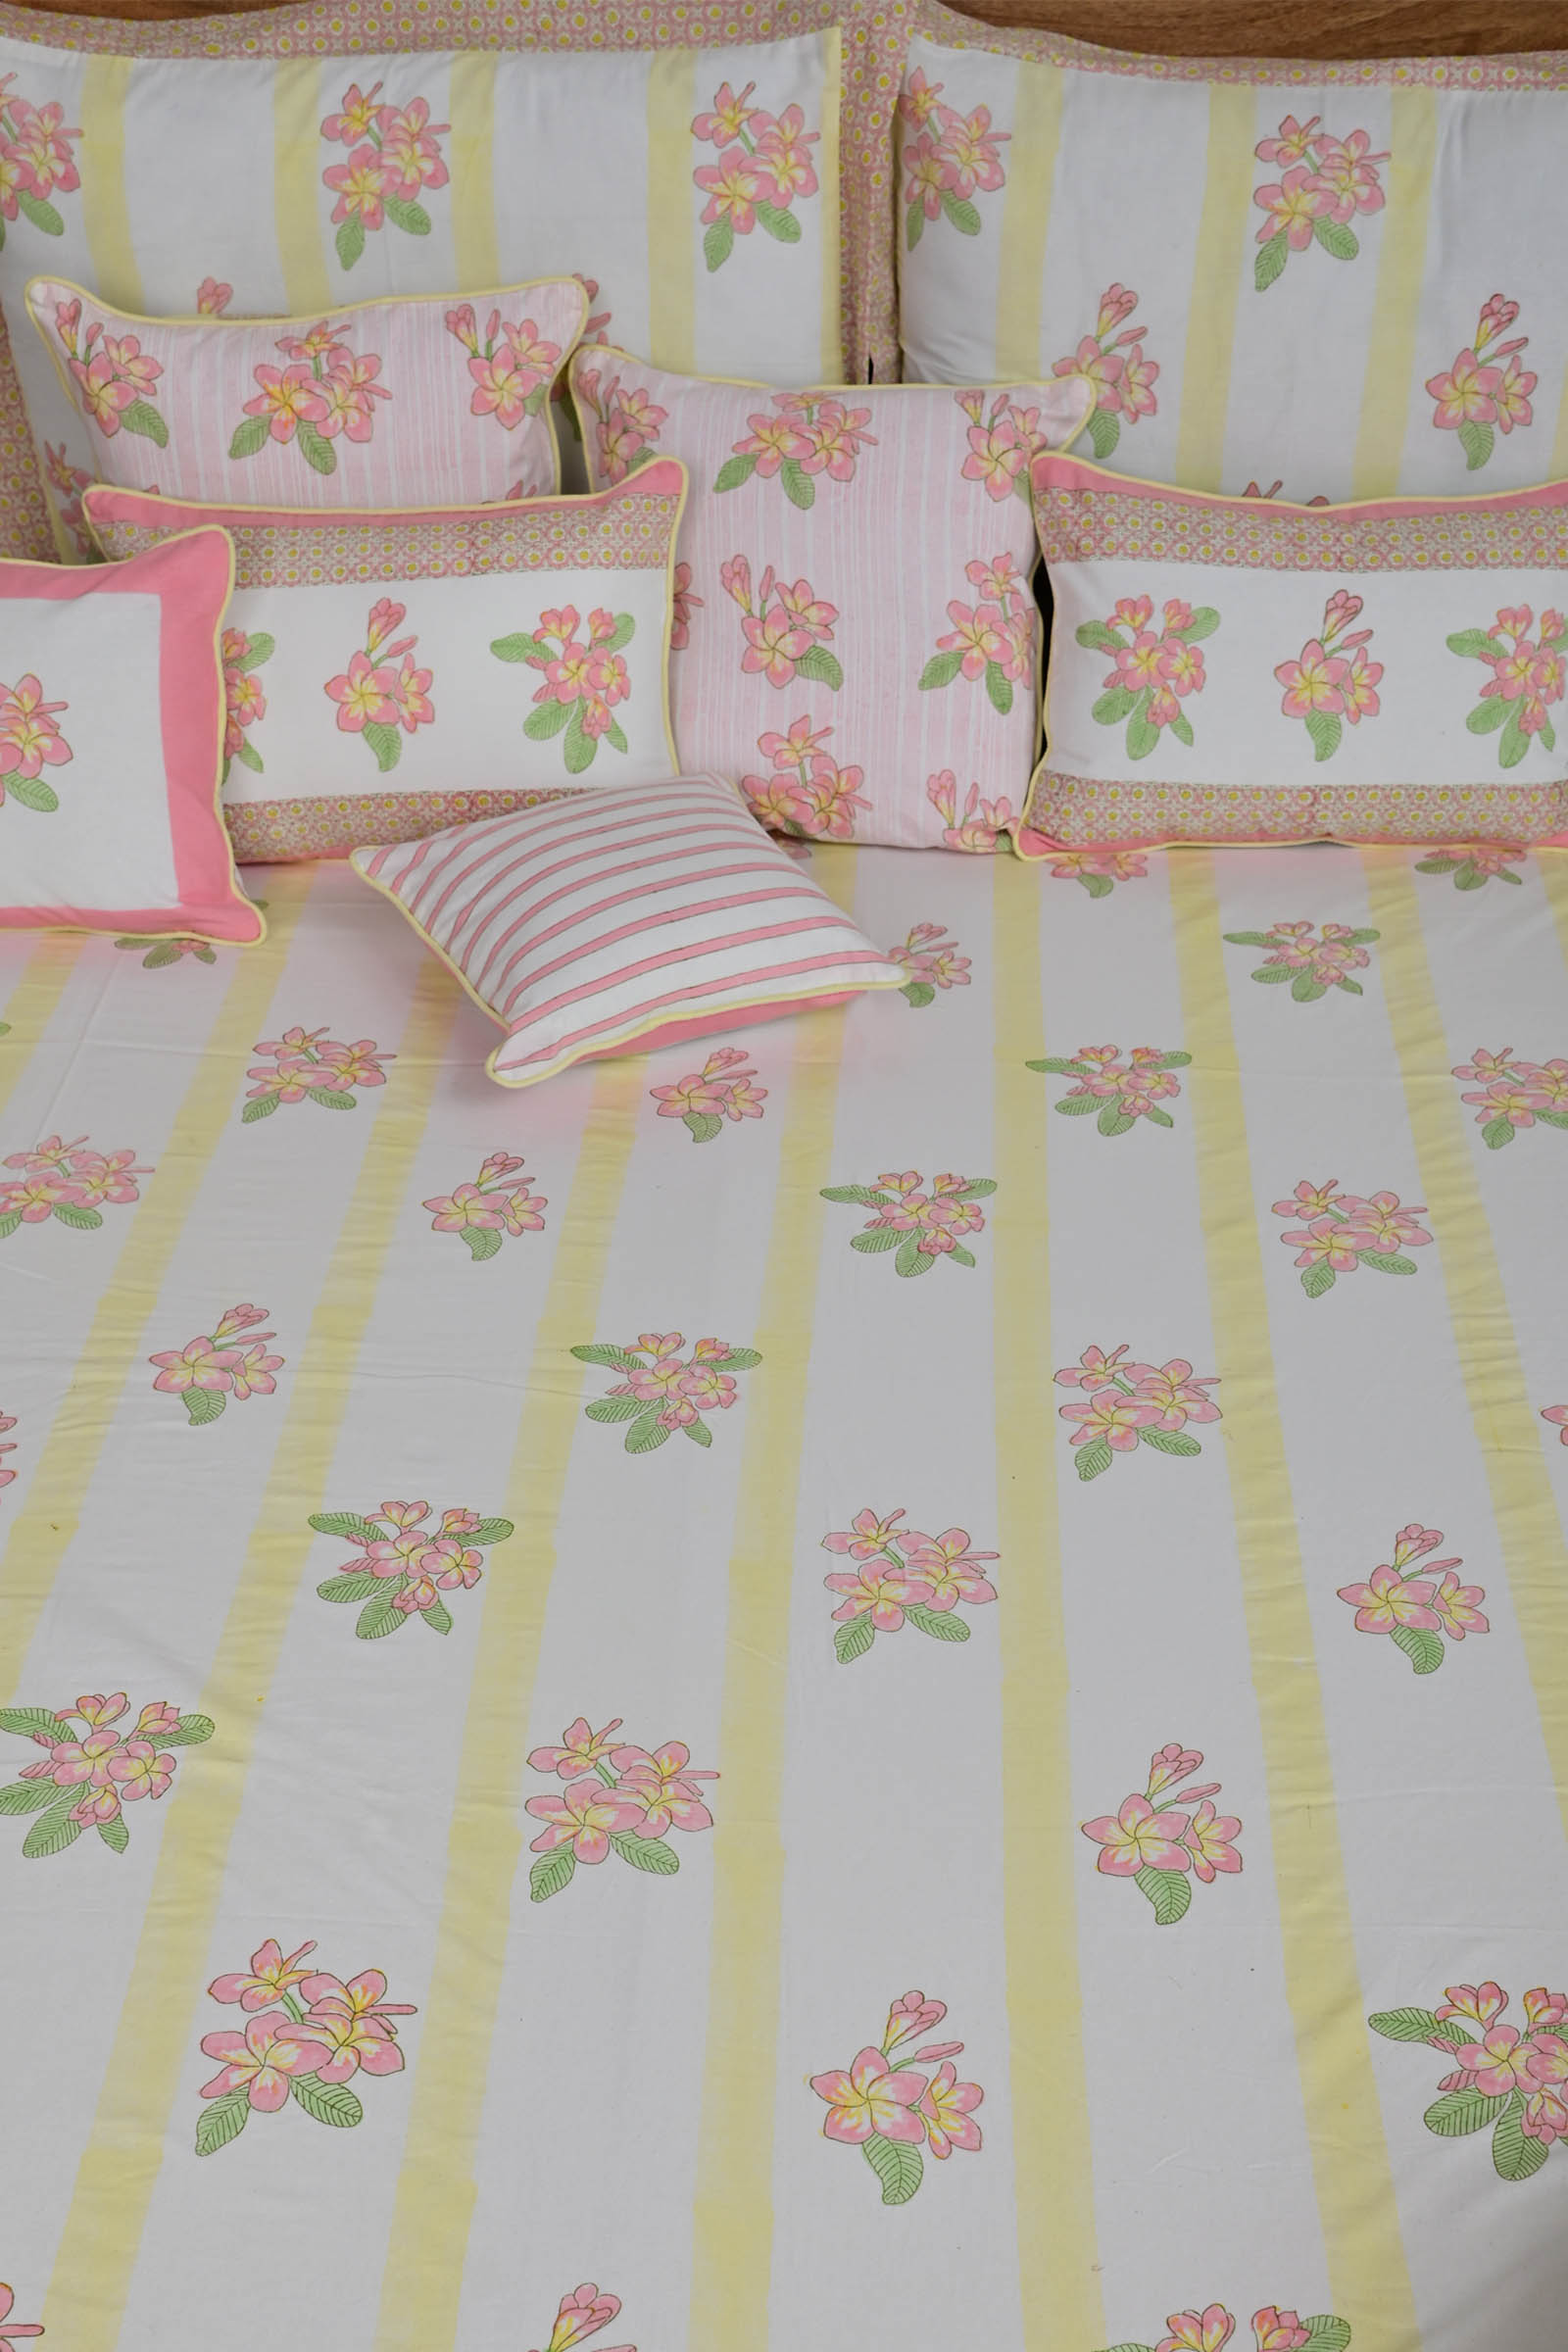 Frangipani Bed Cover